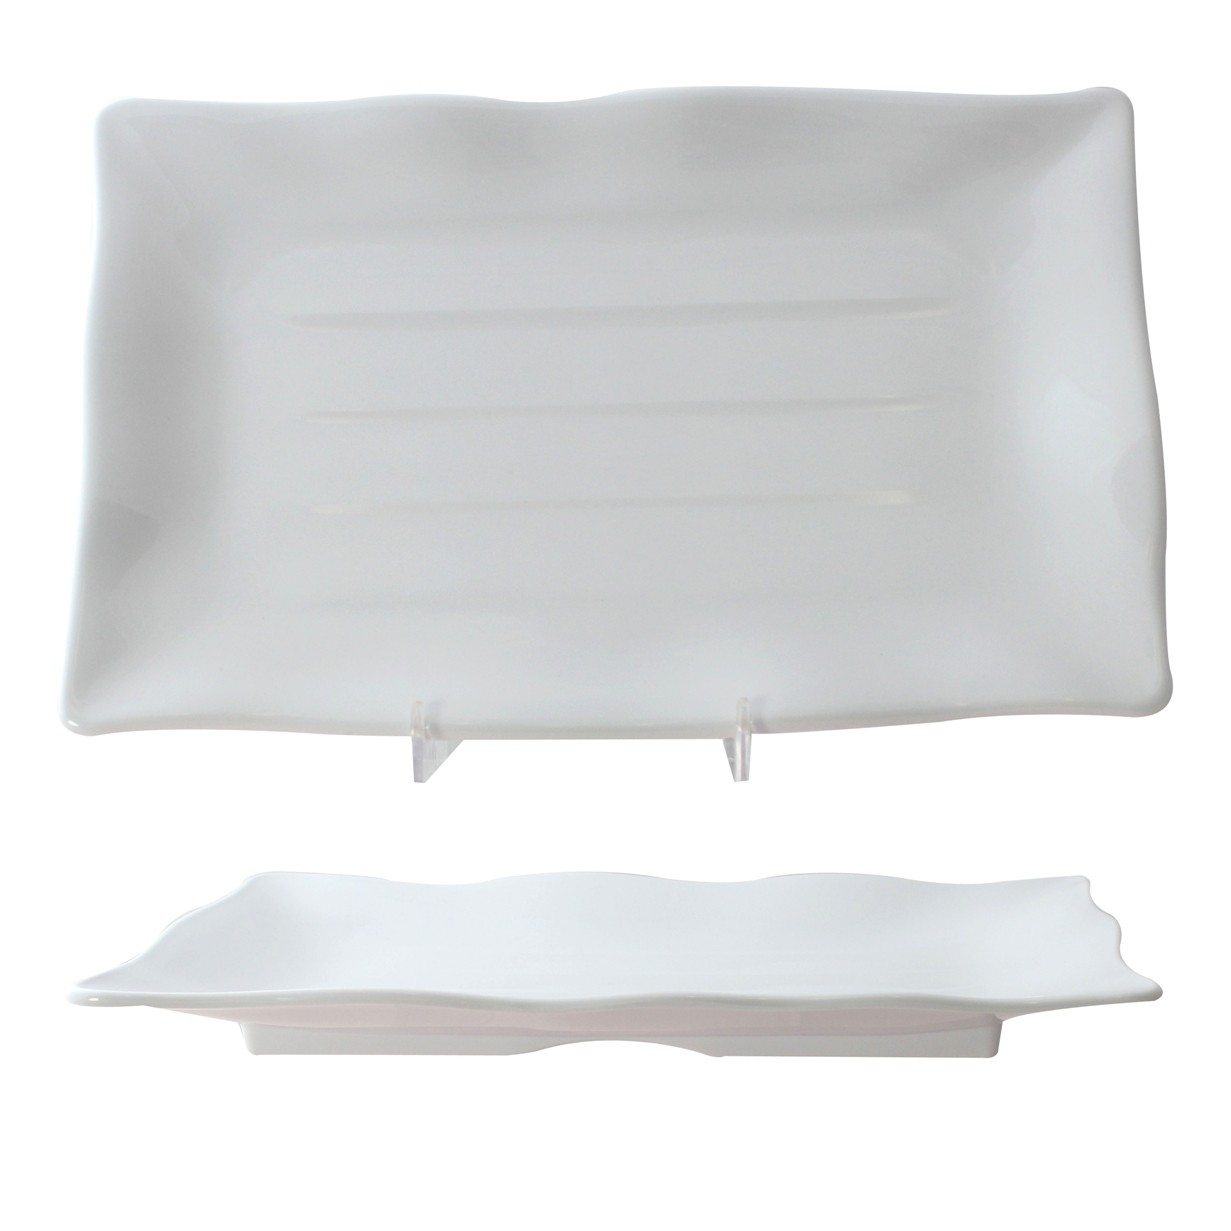 Classic White Melamine Wave Rectangular Plate, 13-1/2